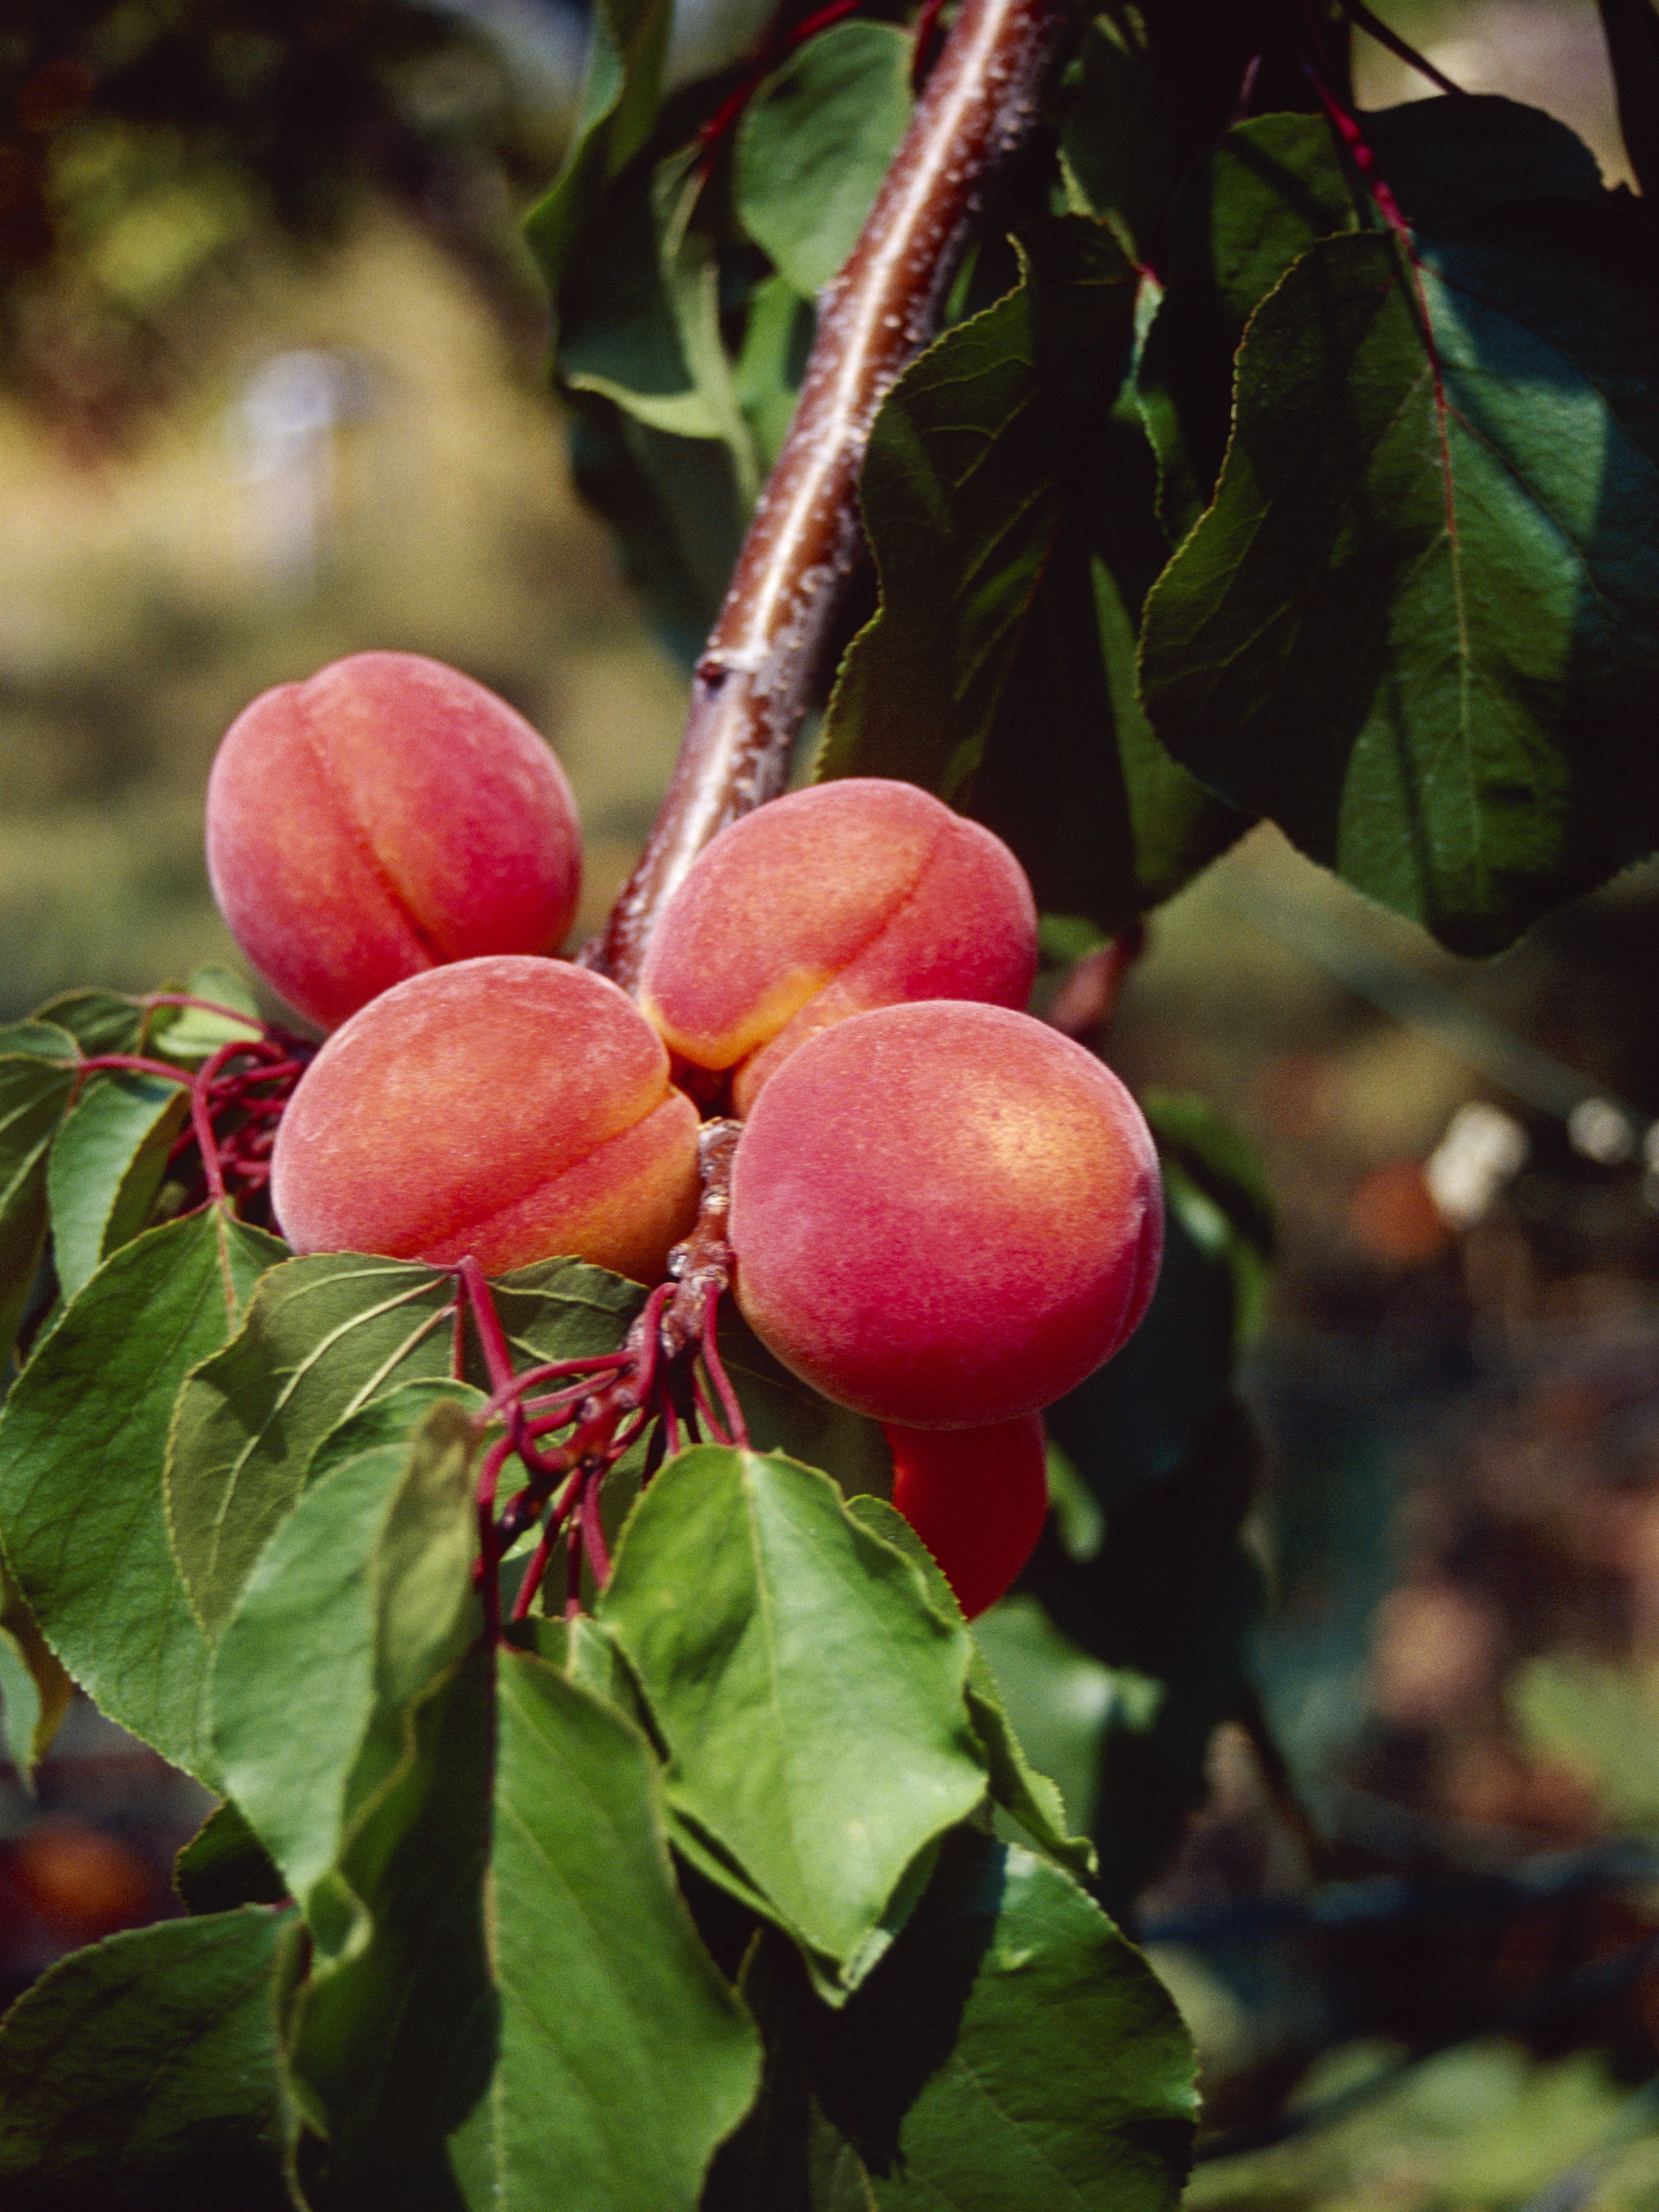 Spray Program for Peach Trees | Home Guides | SF Gate